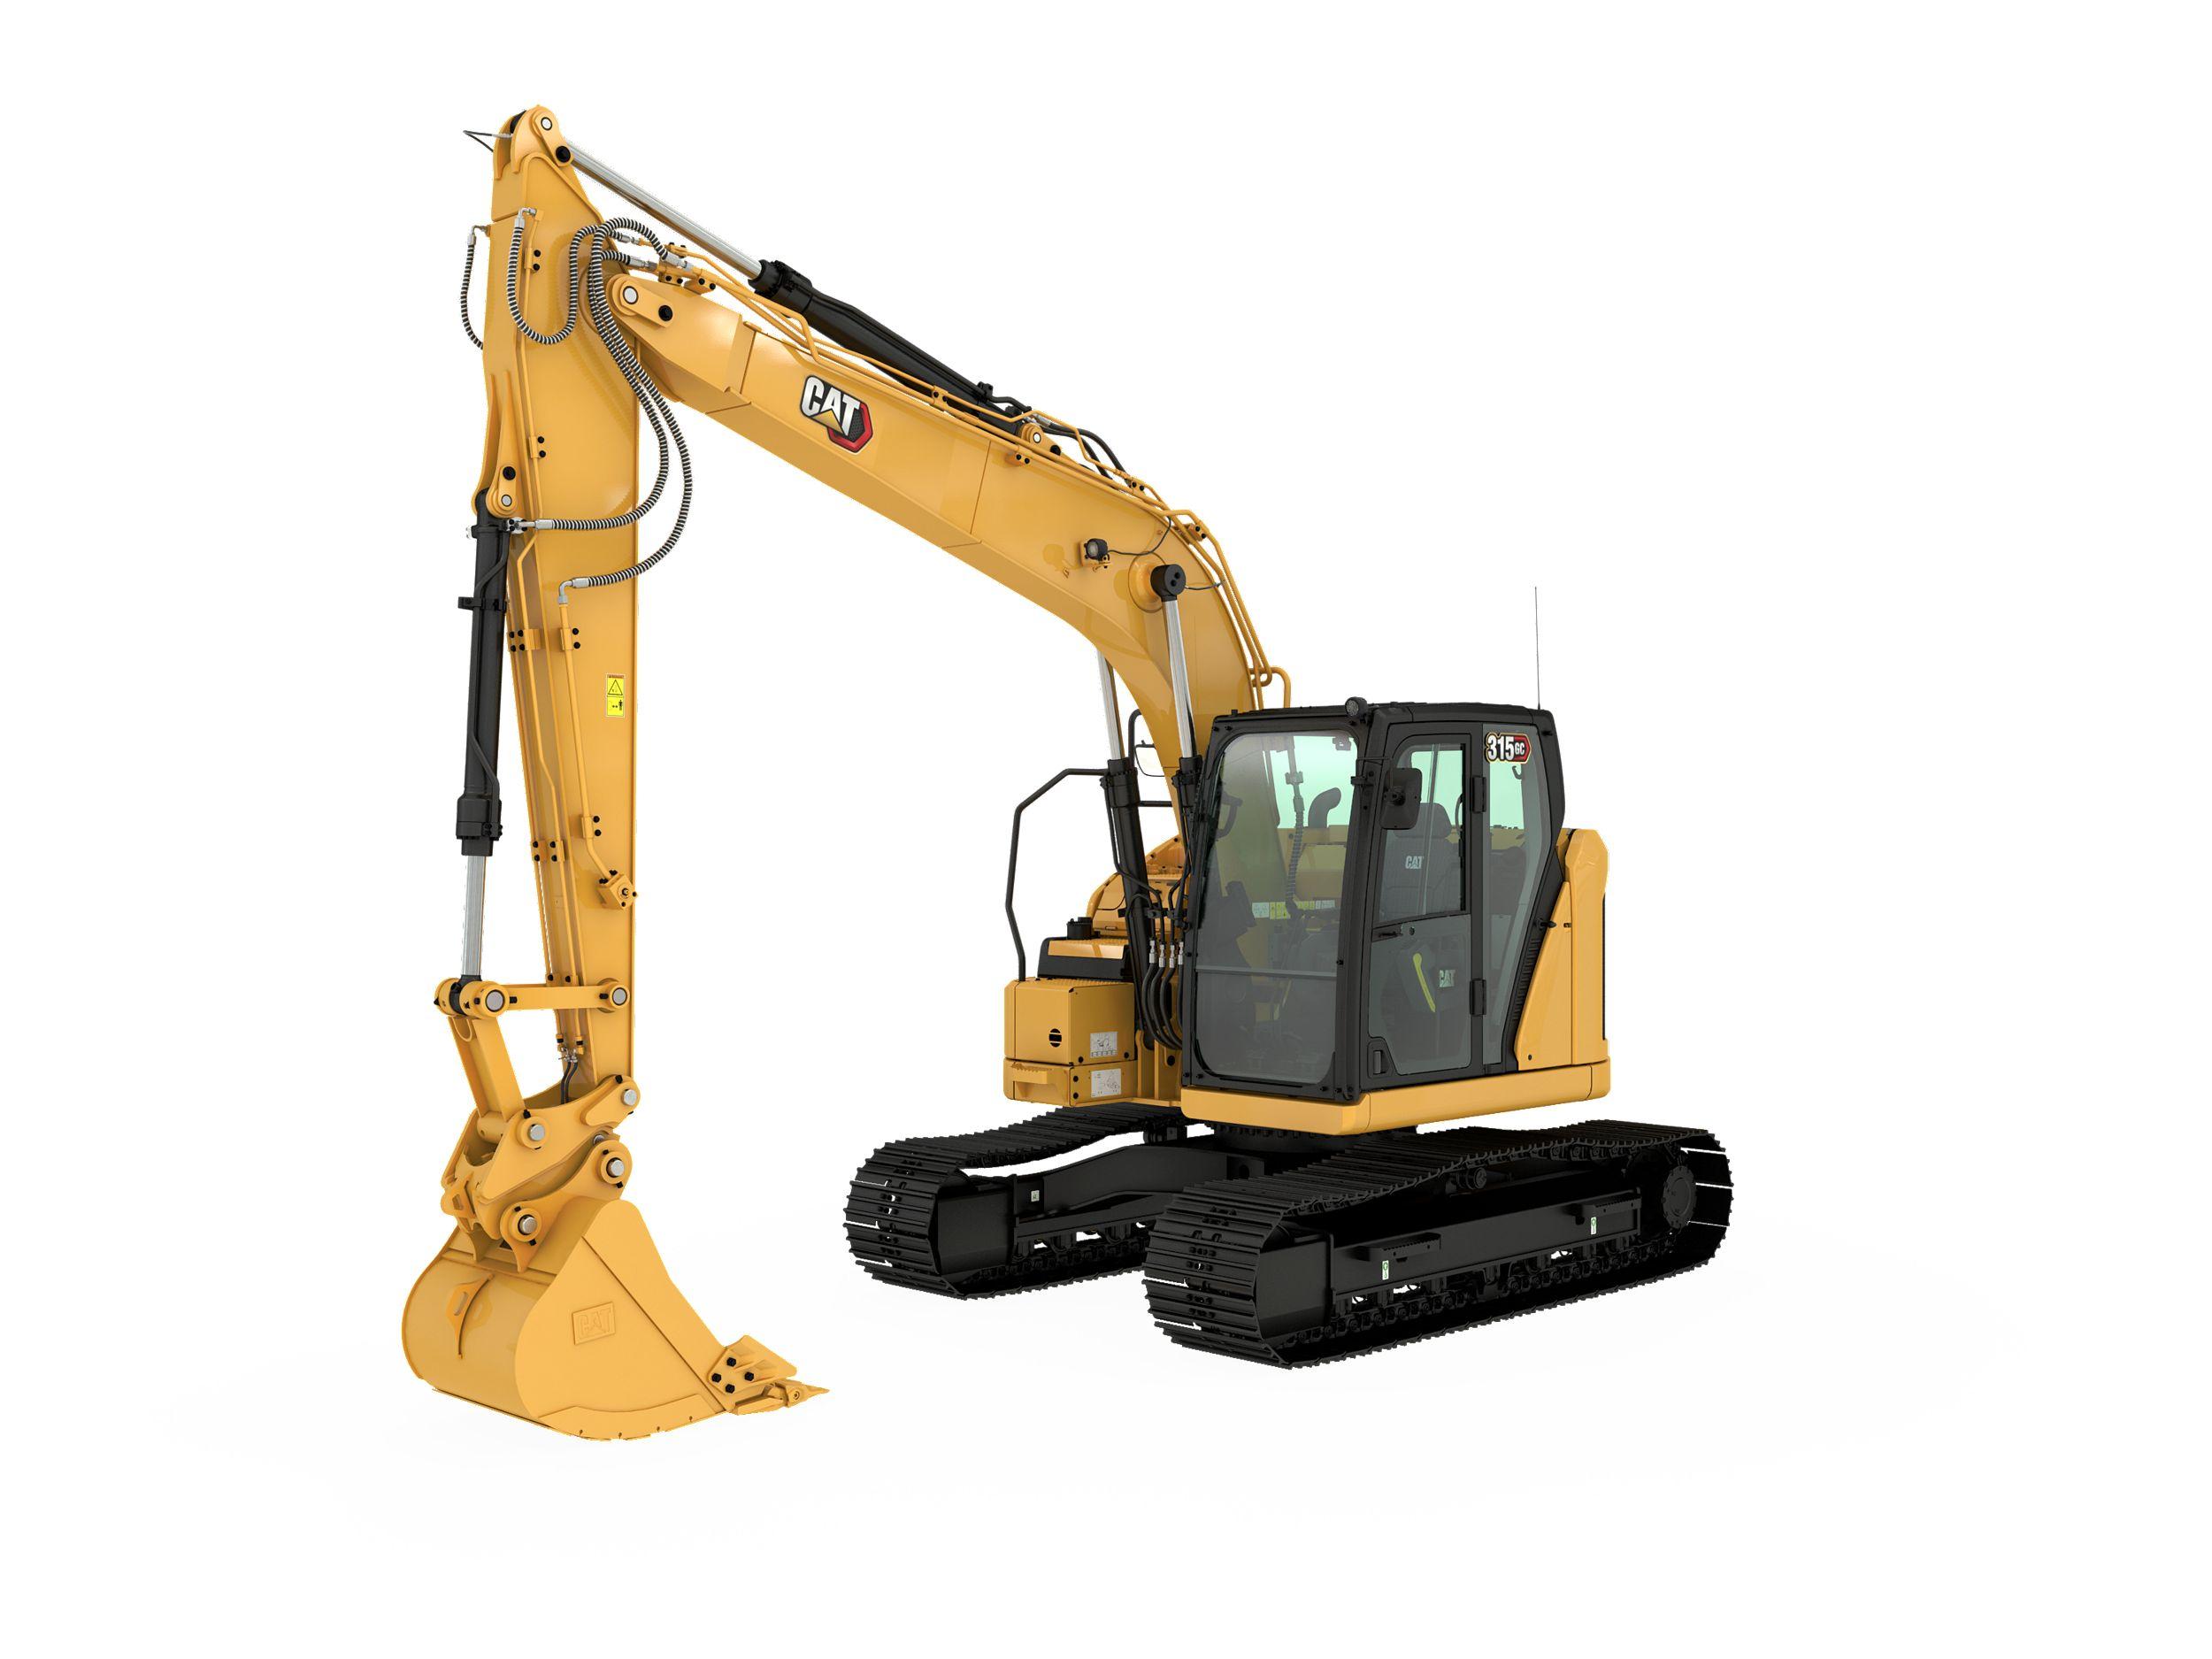 315 GC Hydraulic Excavator